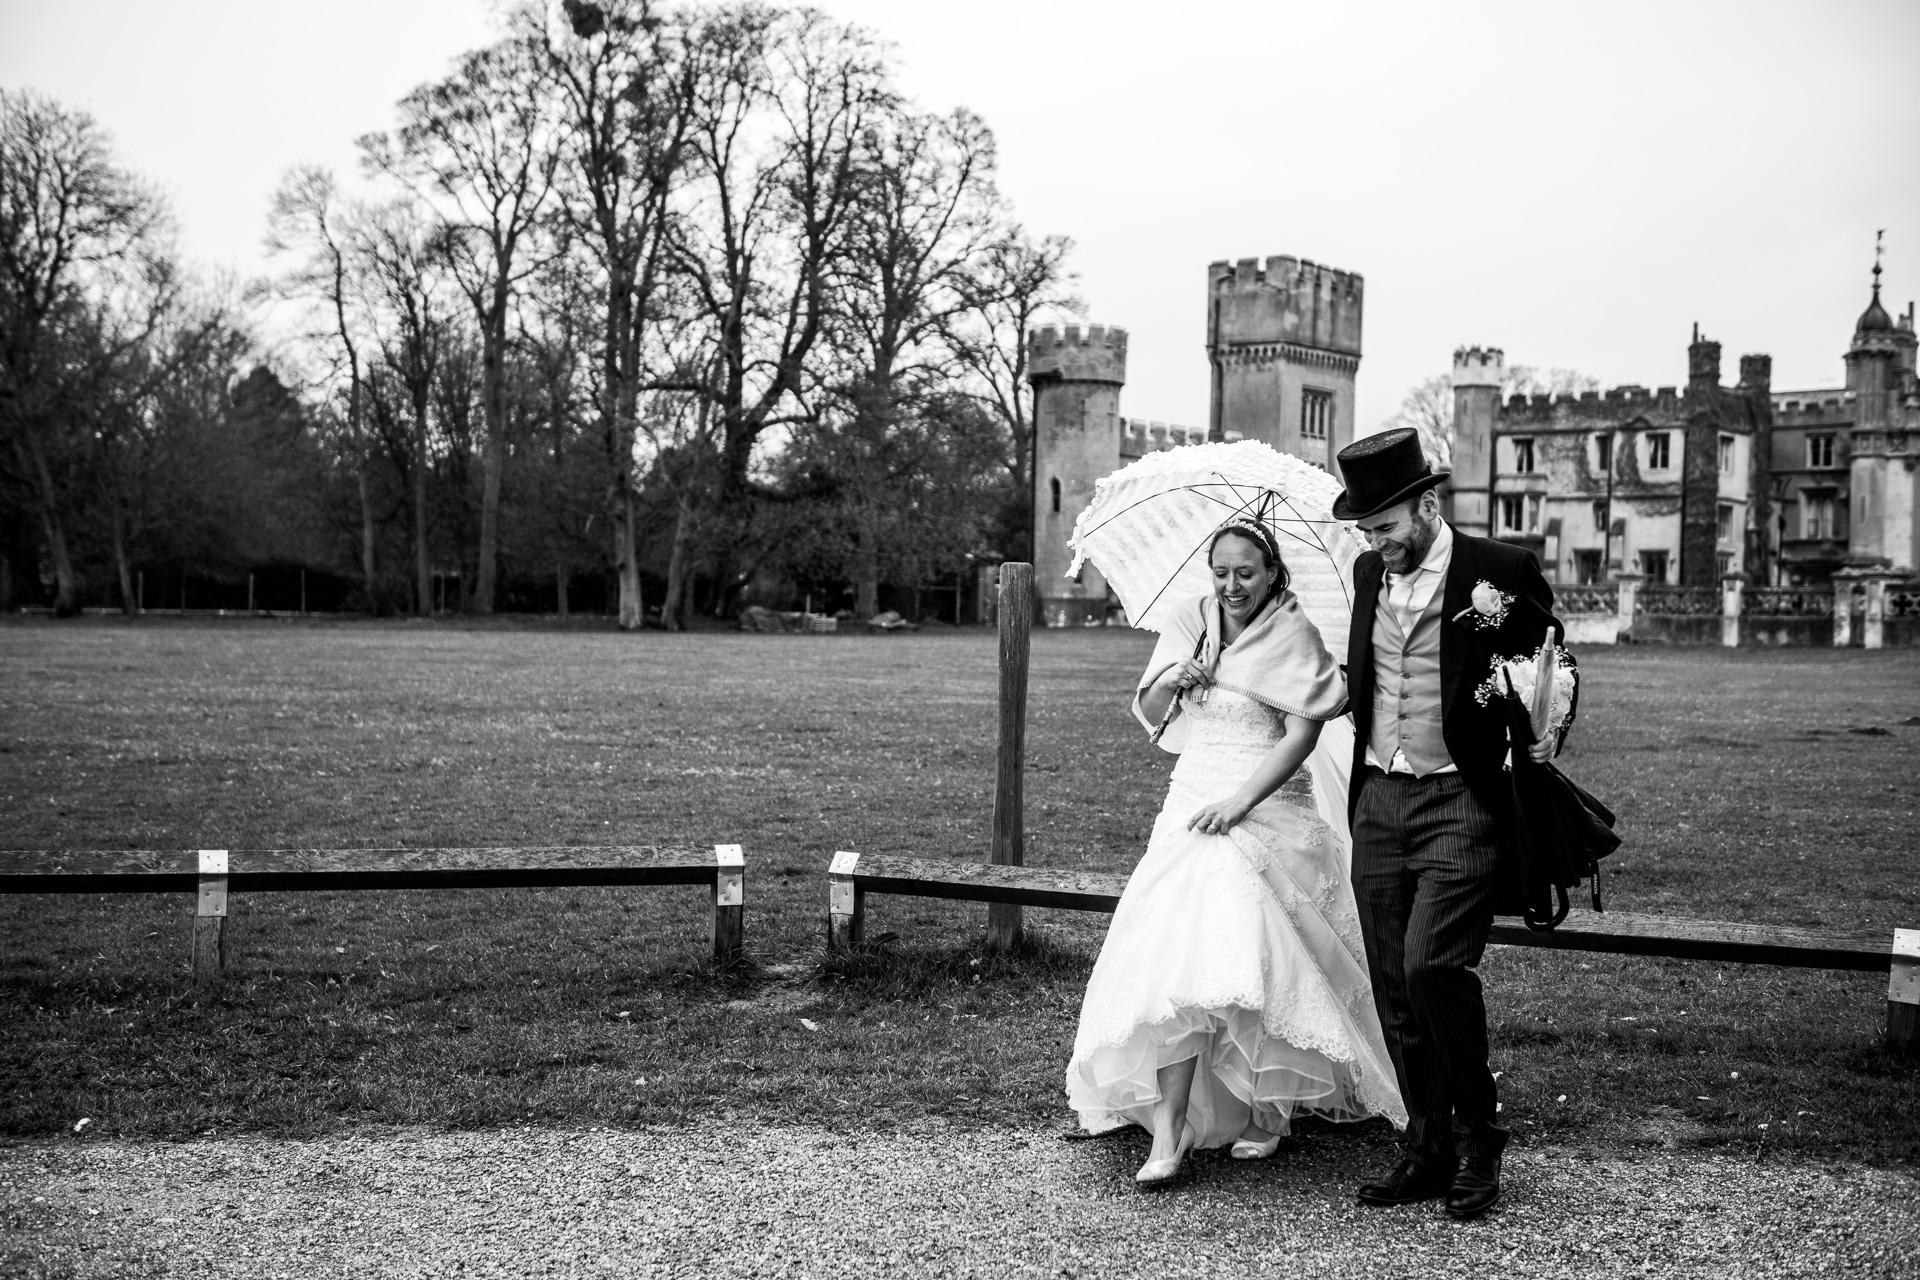 56 Small weddings Hertfordshire